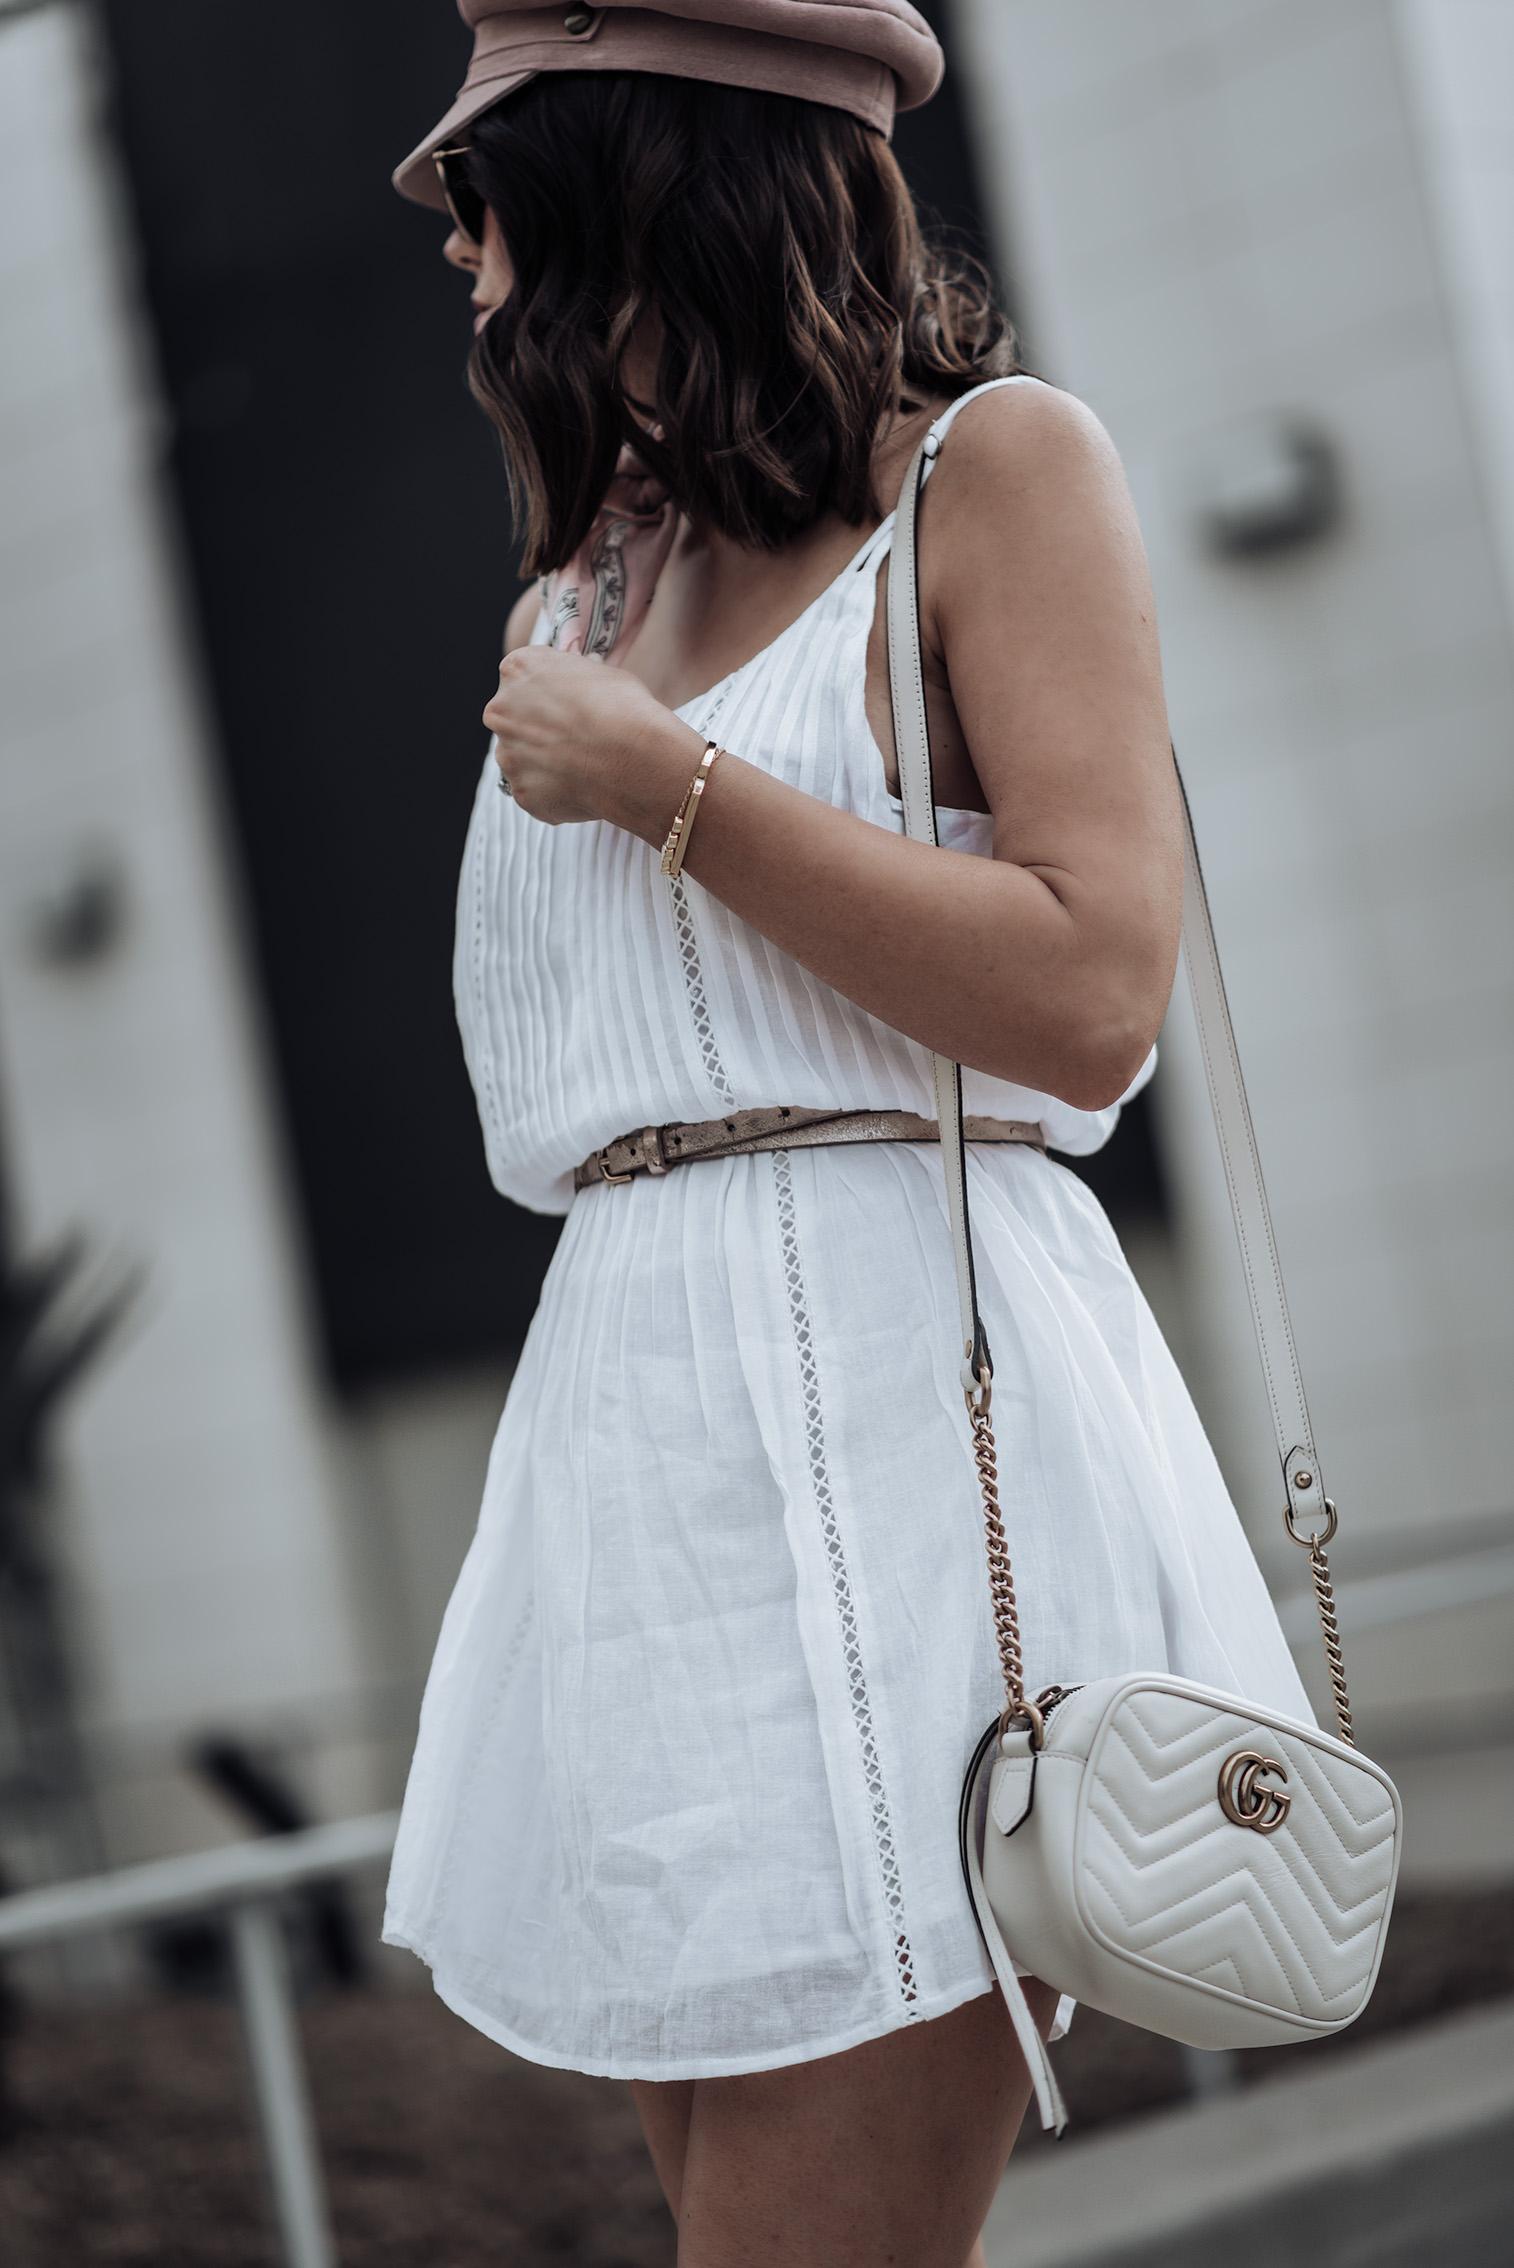 Little white dress | Pink Lola Cap(obsessed) | White Mini Summer Dress | Superga Platforms | Necktie (similar) | Gucci Bag #streetstyle #littlewhitedress #lackofcolor #gucci #liketkit